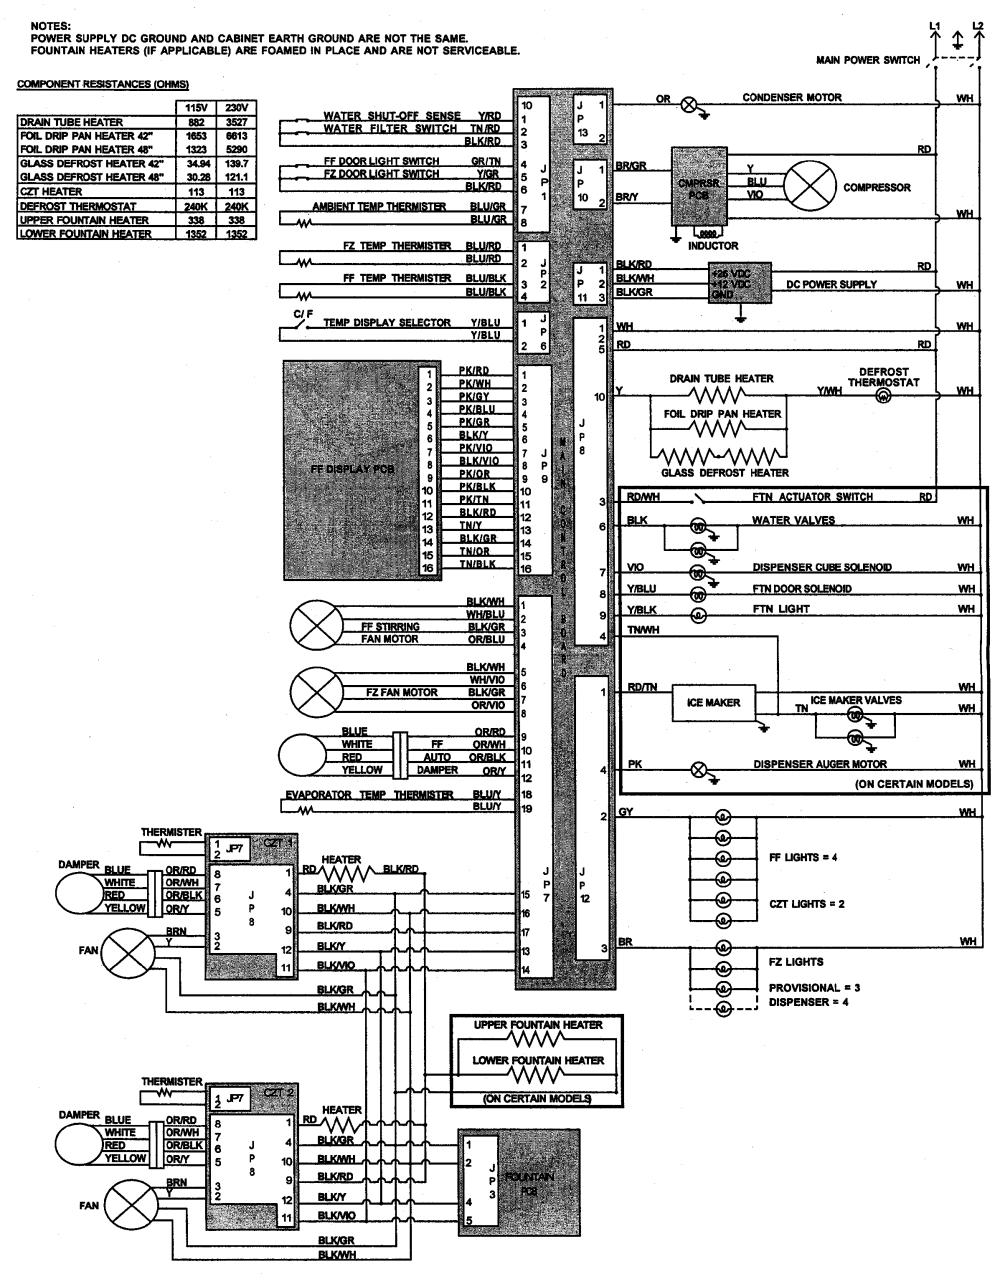 medium resolution of d17 wiring diagram wiring library aht232nut traulsen wiring diagram content resource of wiring diagram u2022 rh